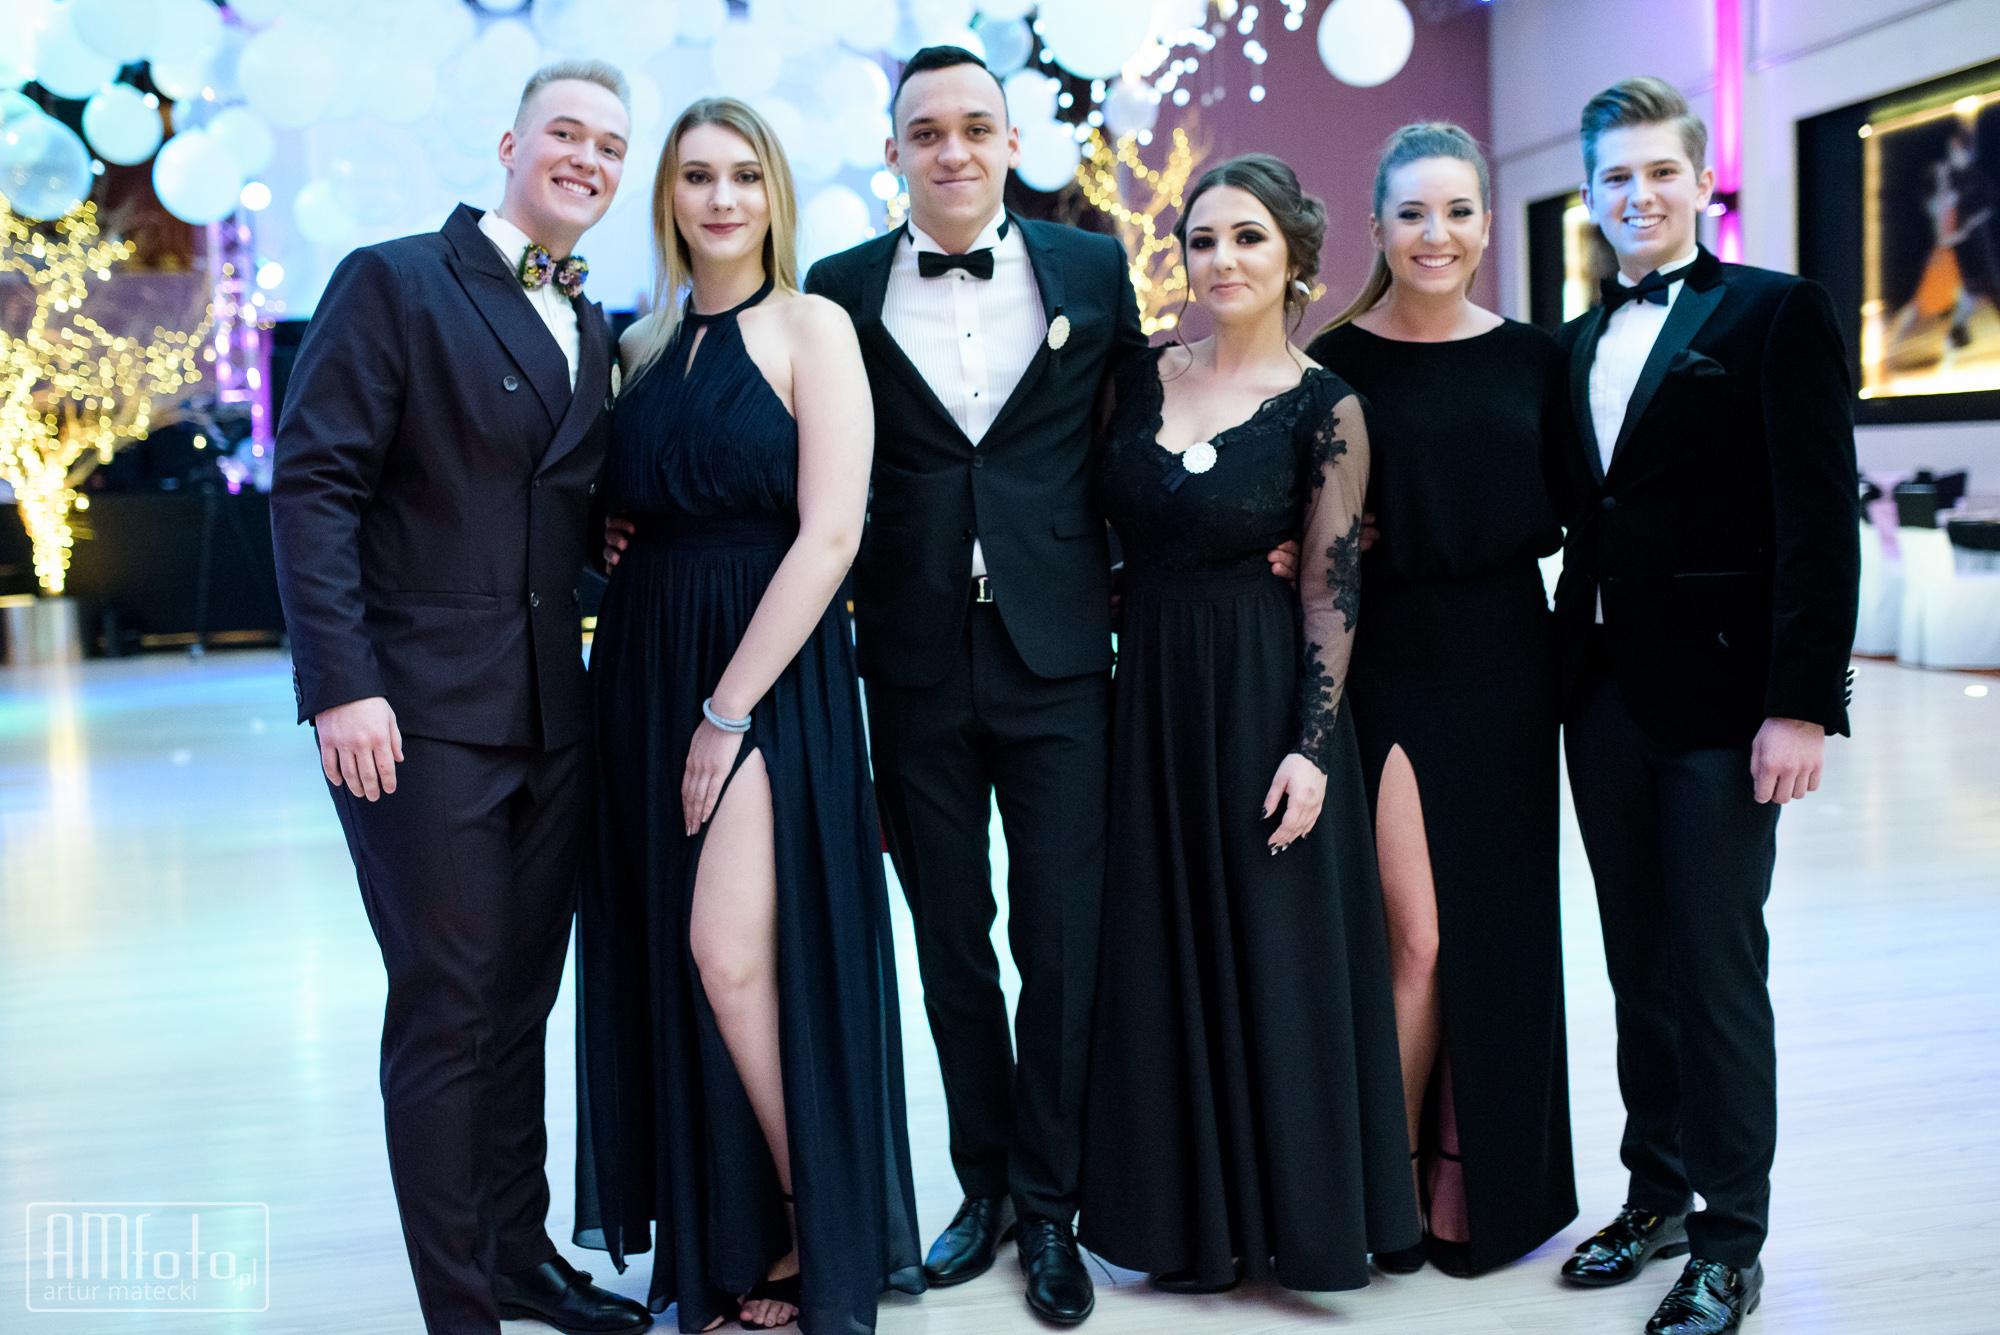 studniowka_2017_3LO_Kalisz_reportaz__www_amfoto_pl-0167.jpg